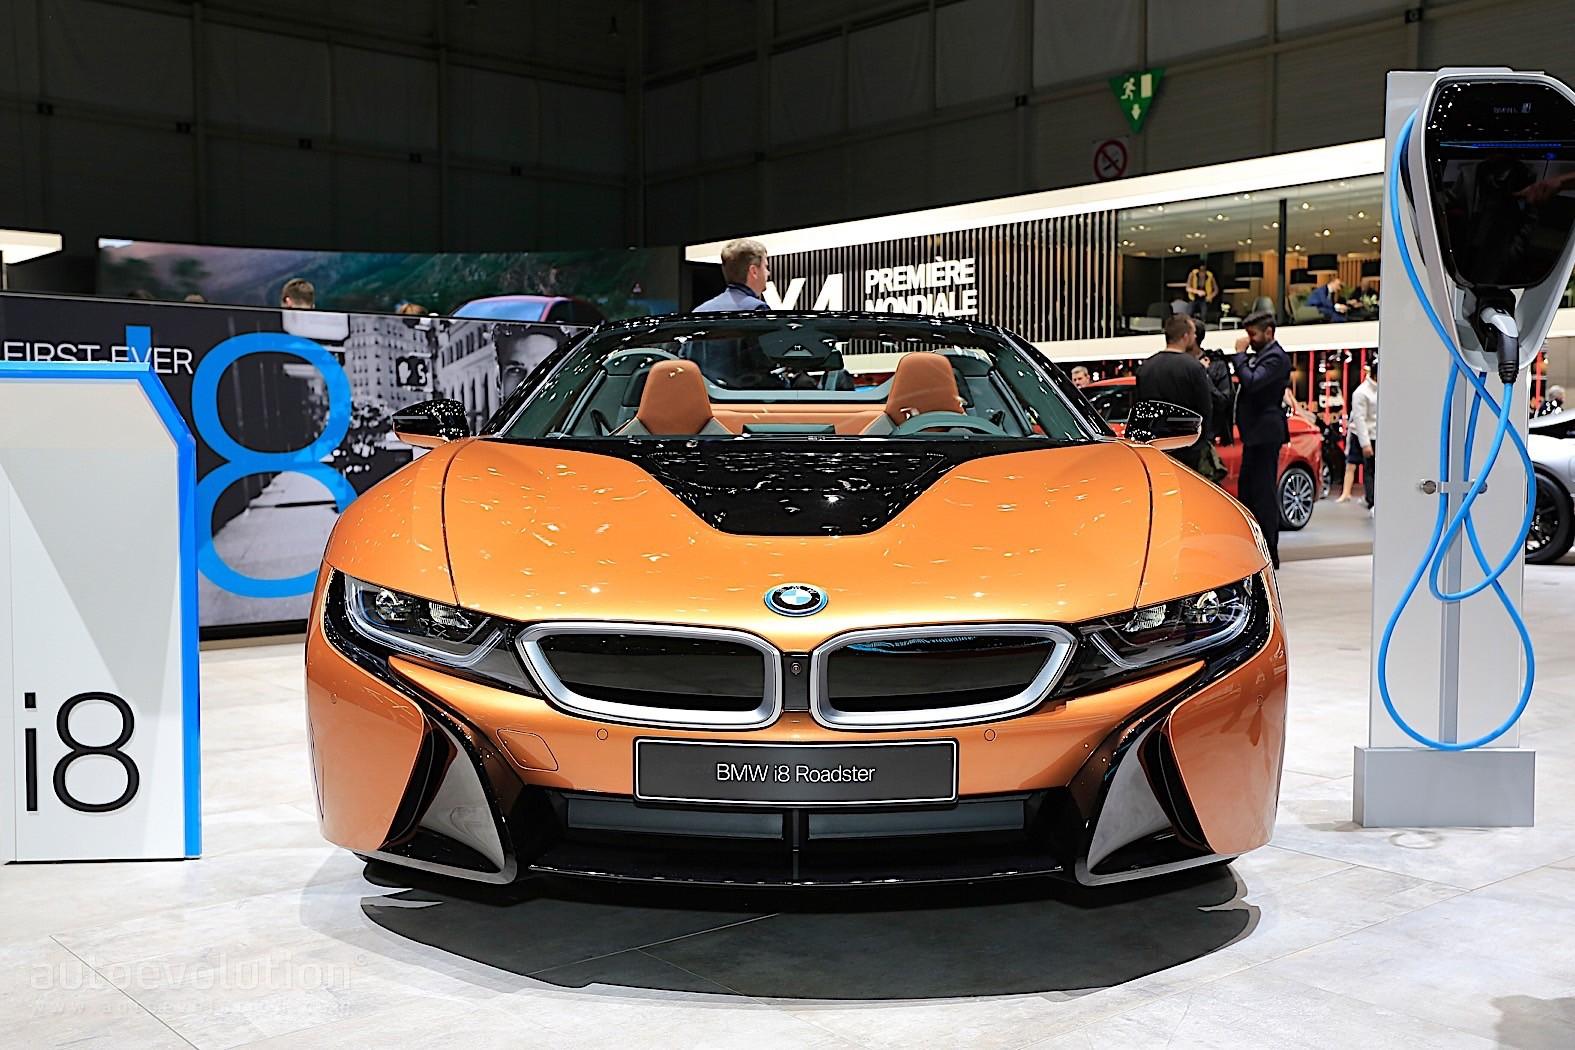 Bmw I8 Roadster Meets Its Fans In Geneva Autoevolution